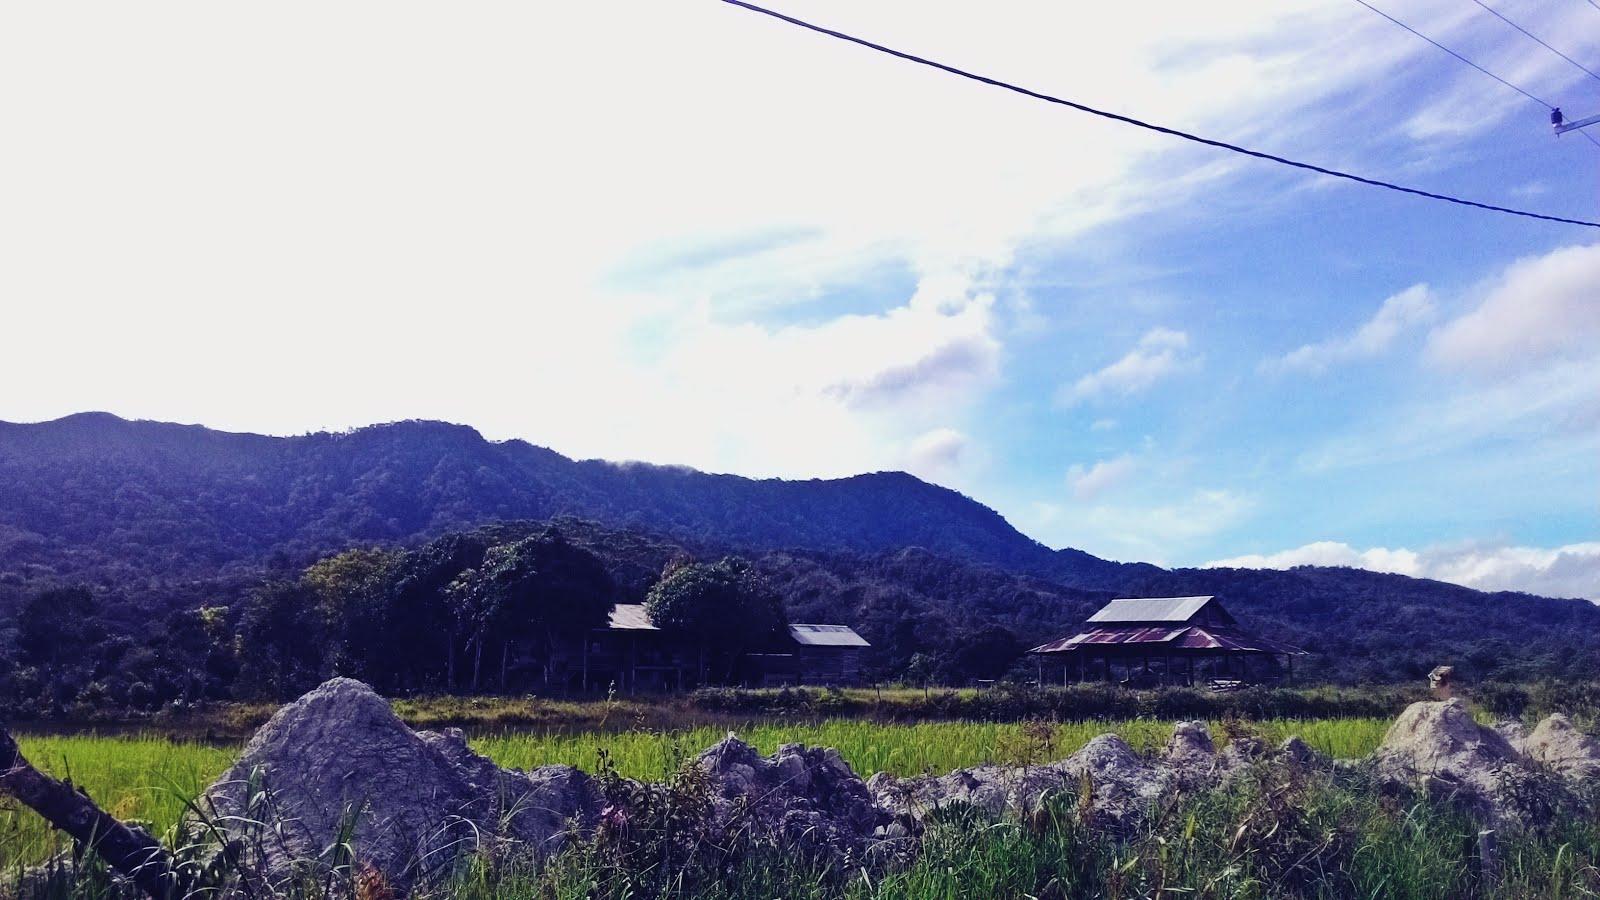 July 2016 Ragil Desa Long Kiwan Kecamatan Krayan Induk Kabupaten